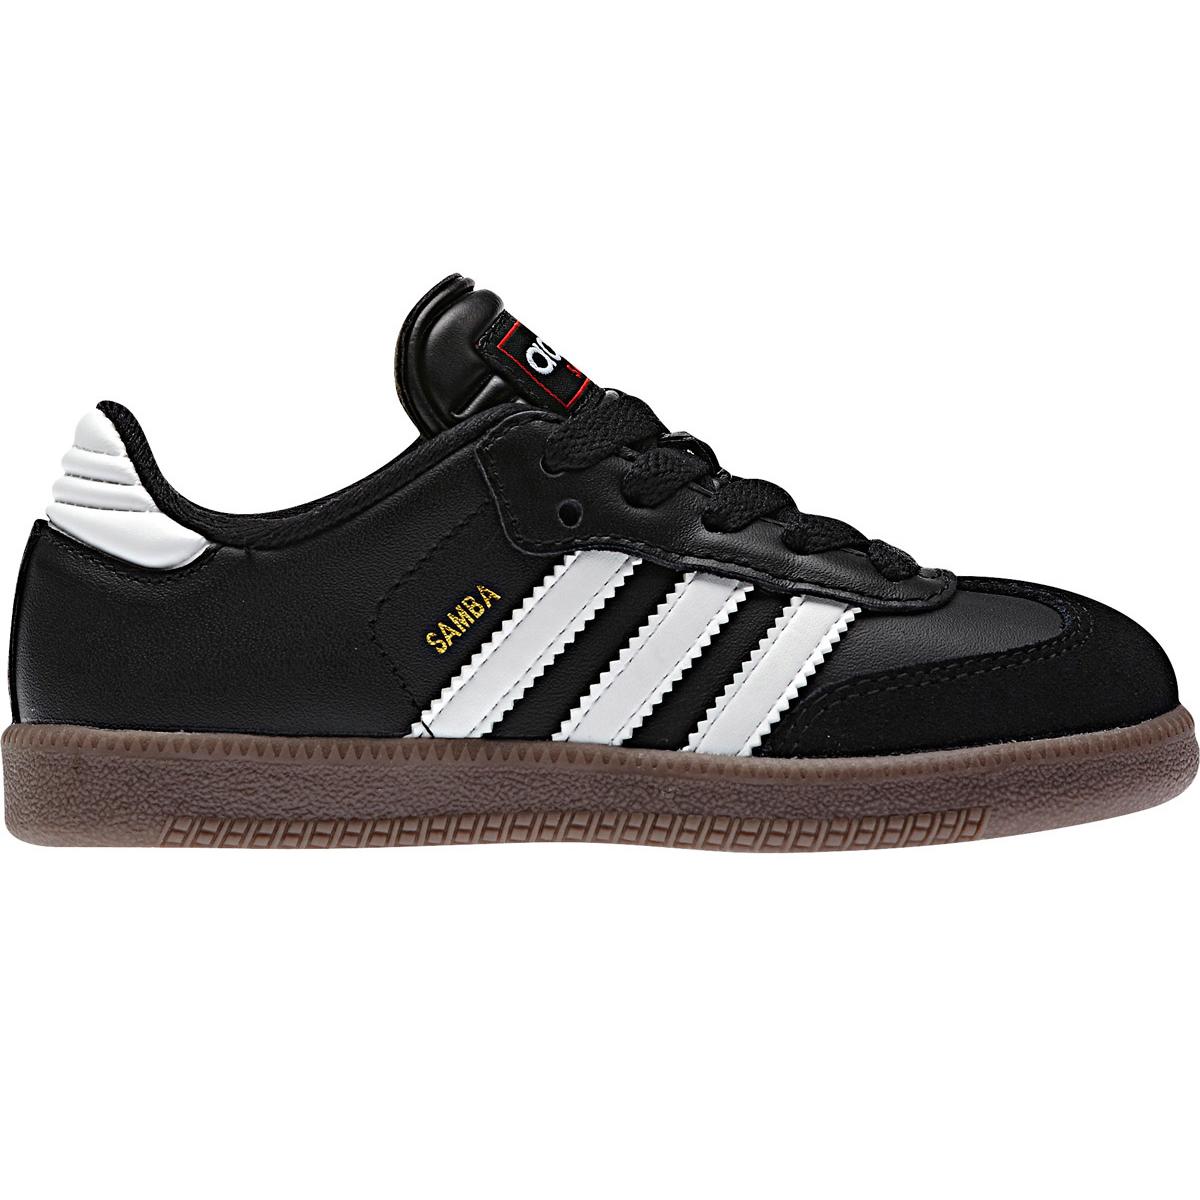 Adidas Kids' Samba Classic Soccer Shoe - Black, 3.5